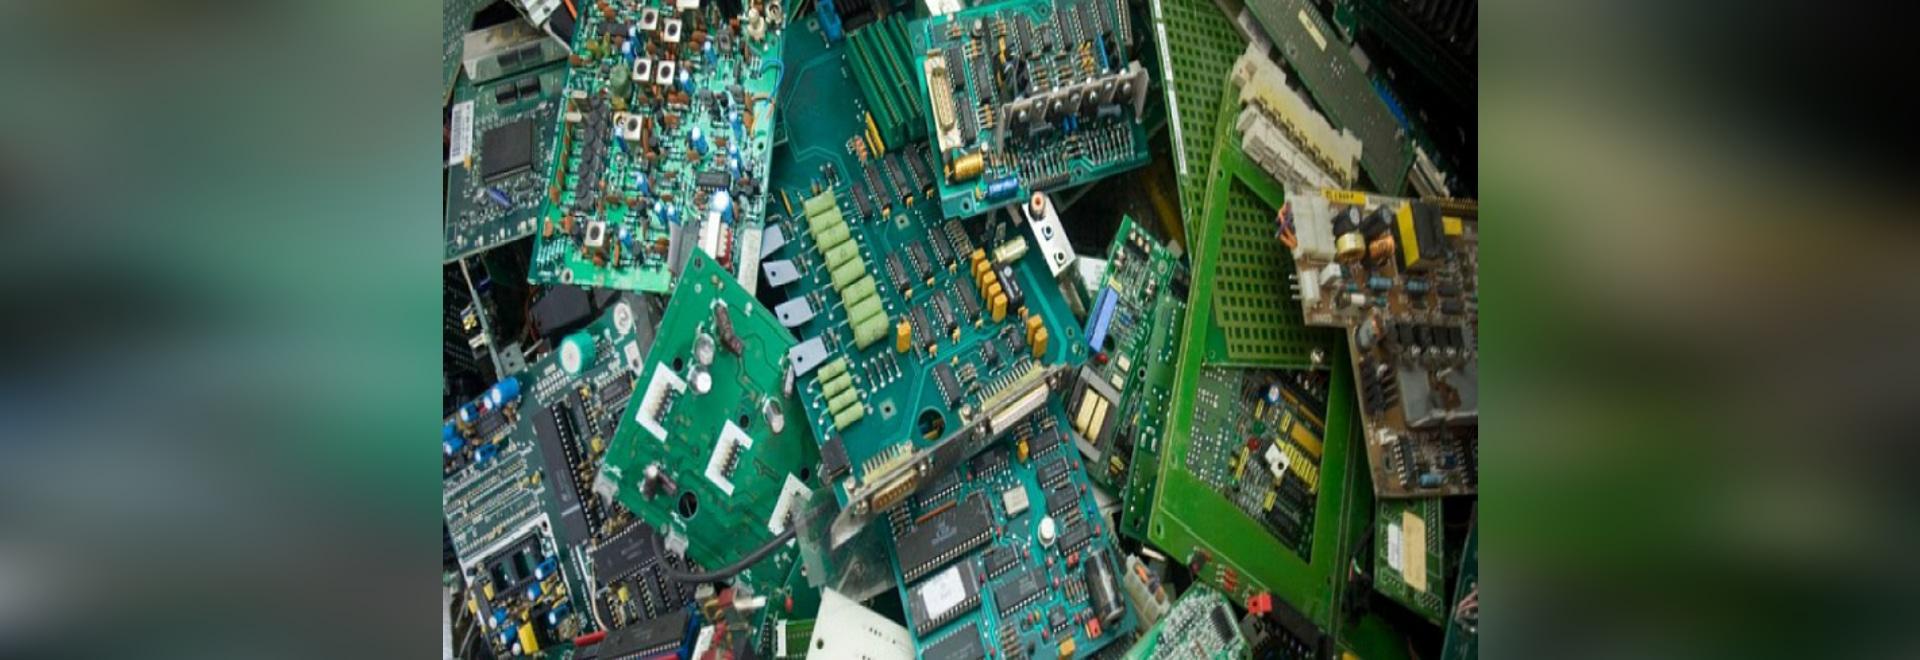 Marine E-Waste: Gold Rush or Shipwreck